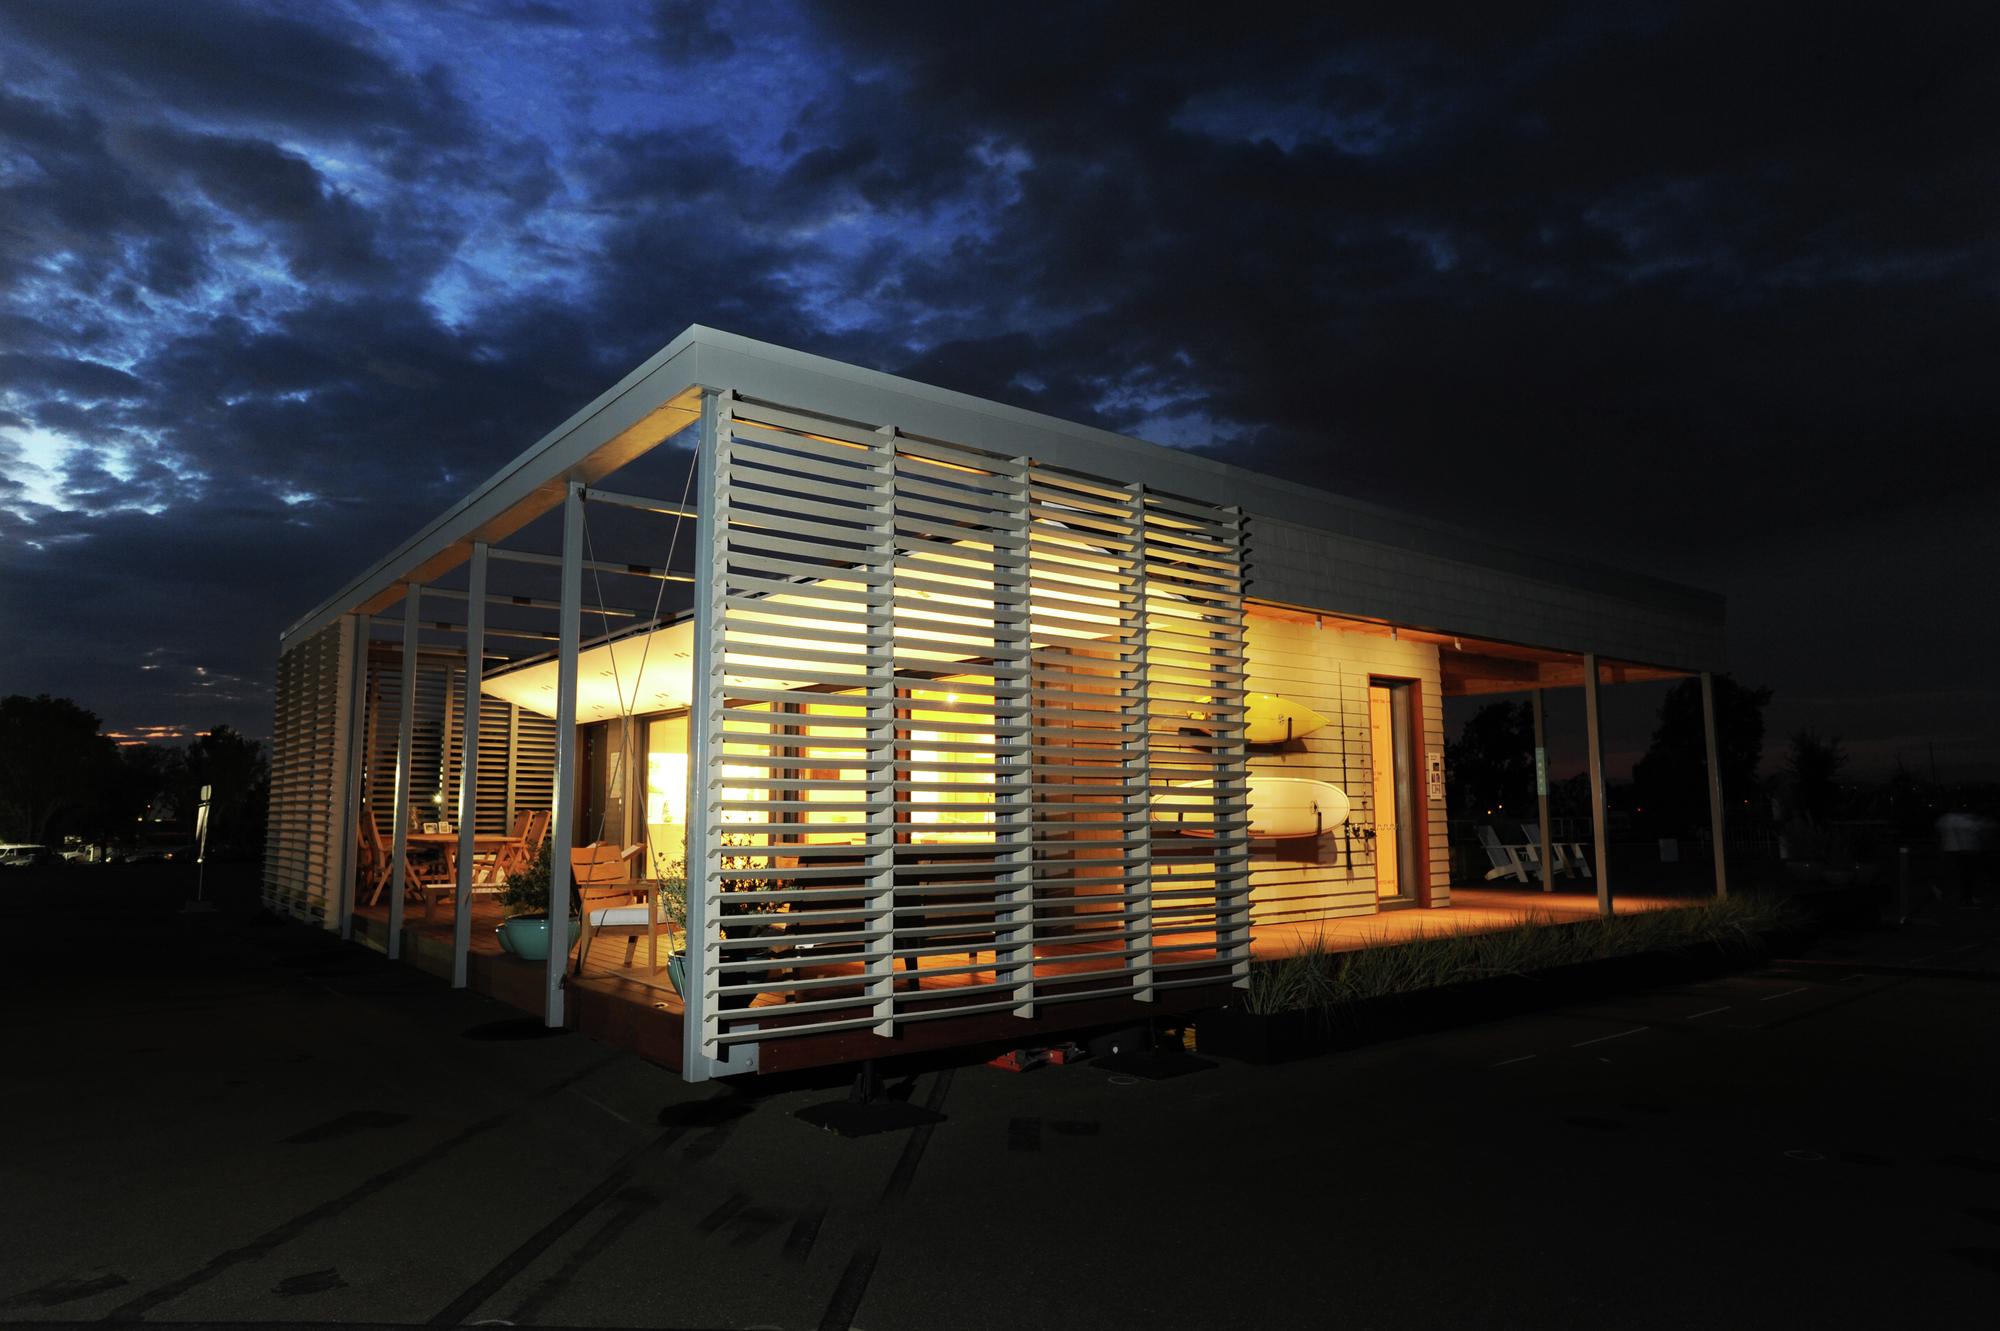 aa5b7ab63 Stevens  Hurricane-Resilient SU+RE House Wins Solar Decathlon 2015